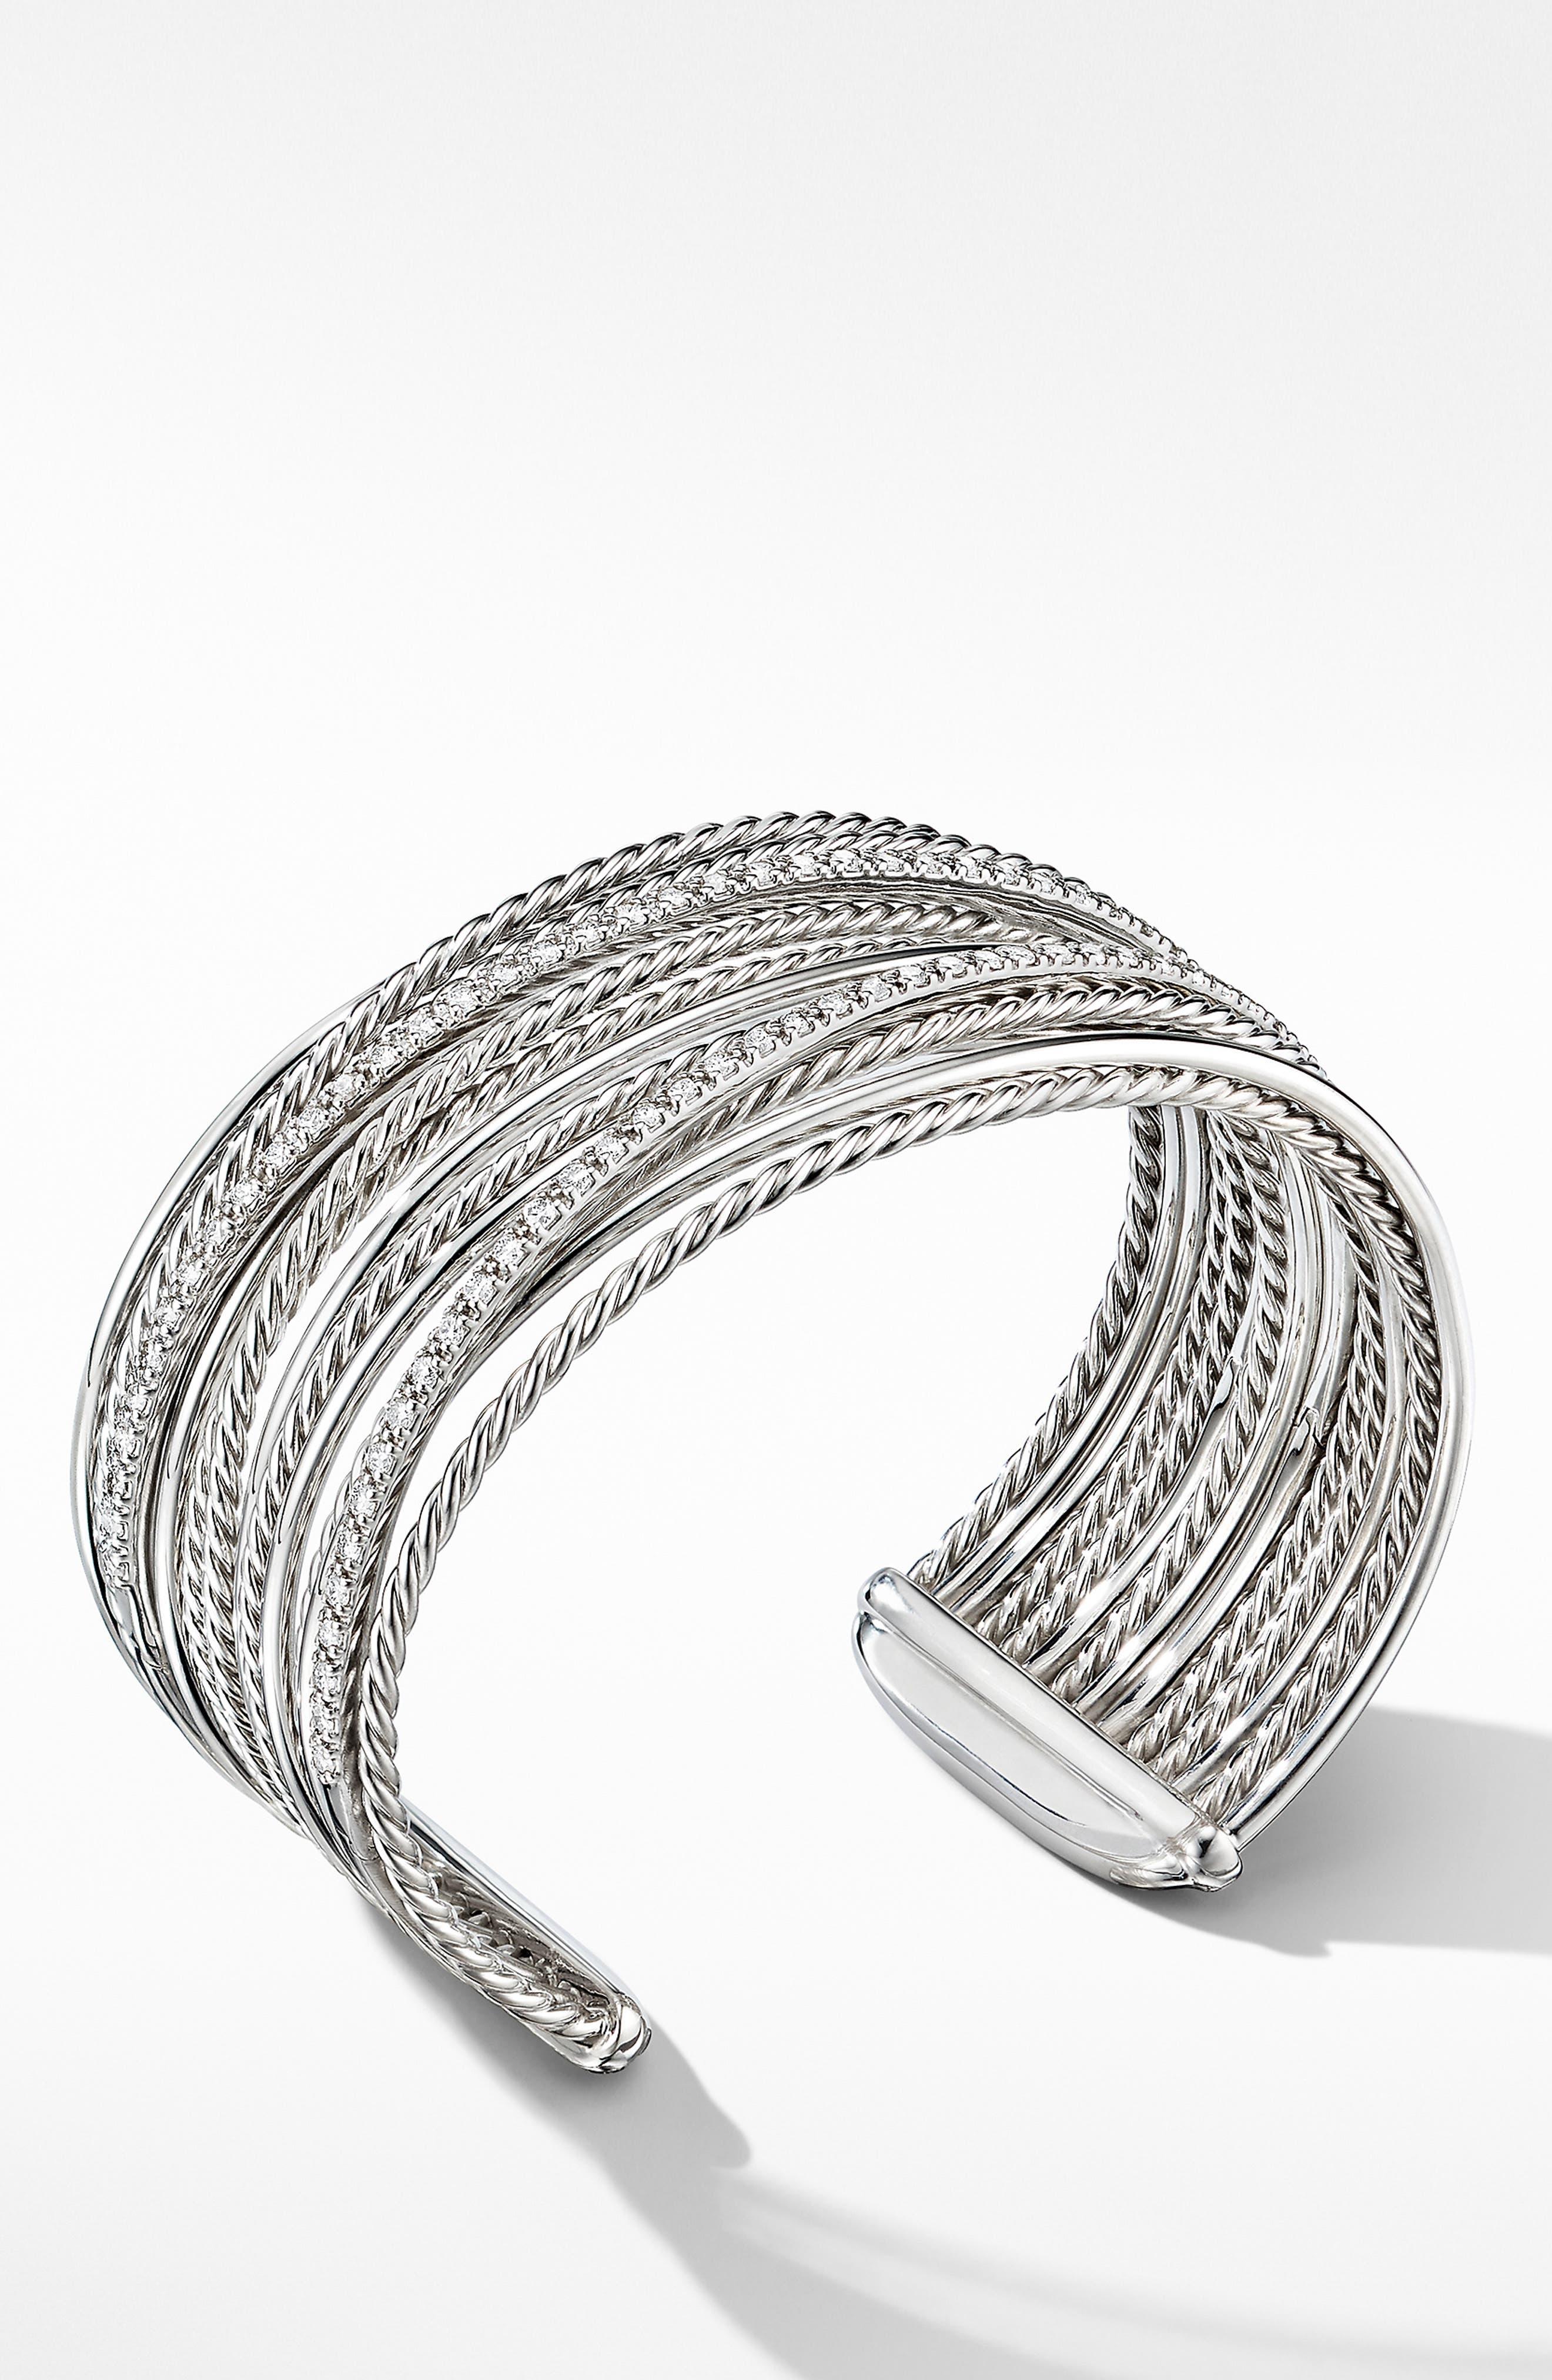 DAVID YURMAN, Crossover Cuff Bracelet with Diamonds, Alternate thumbnail 2, color, SILVER/ DIAMOND